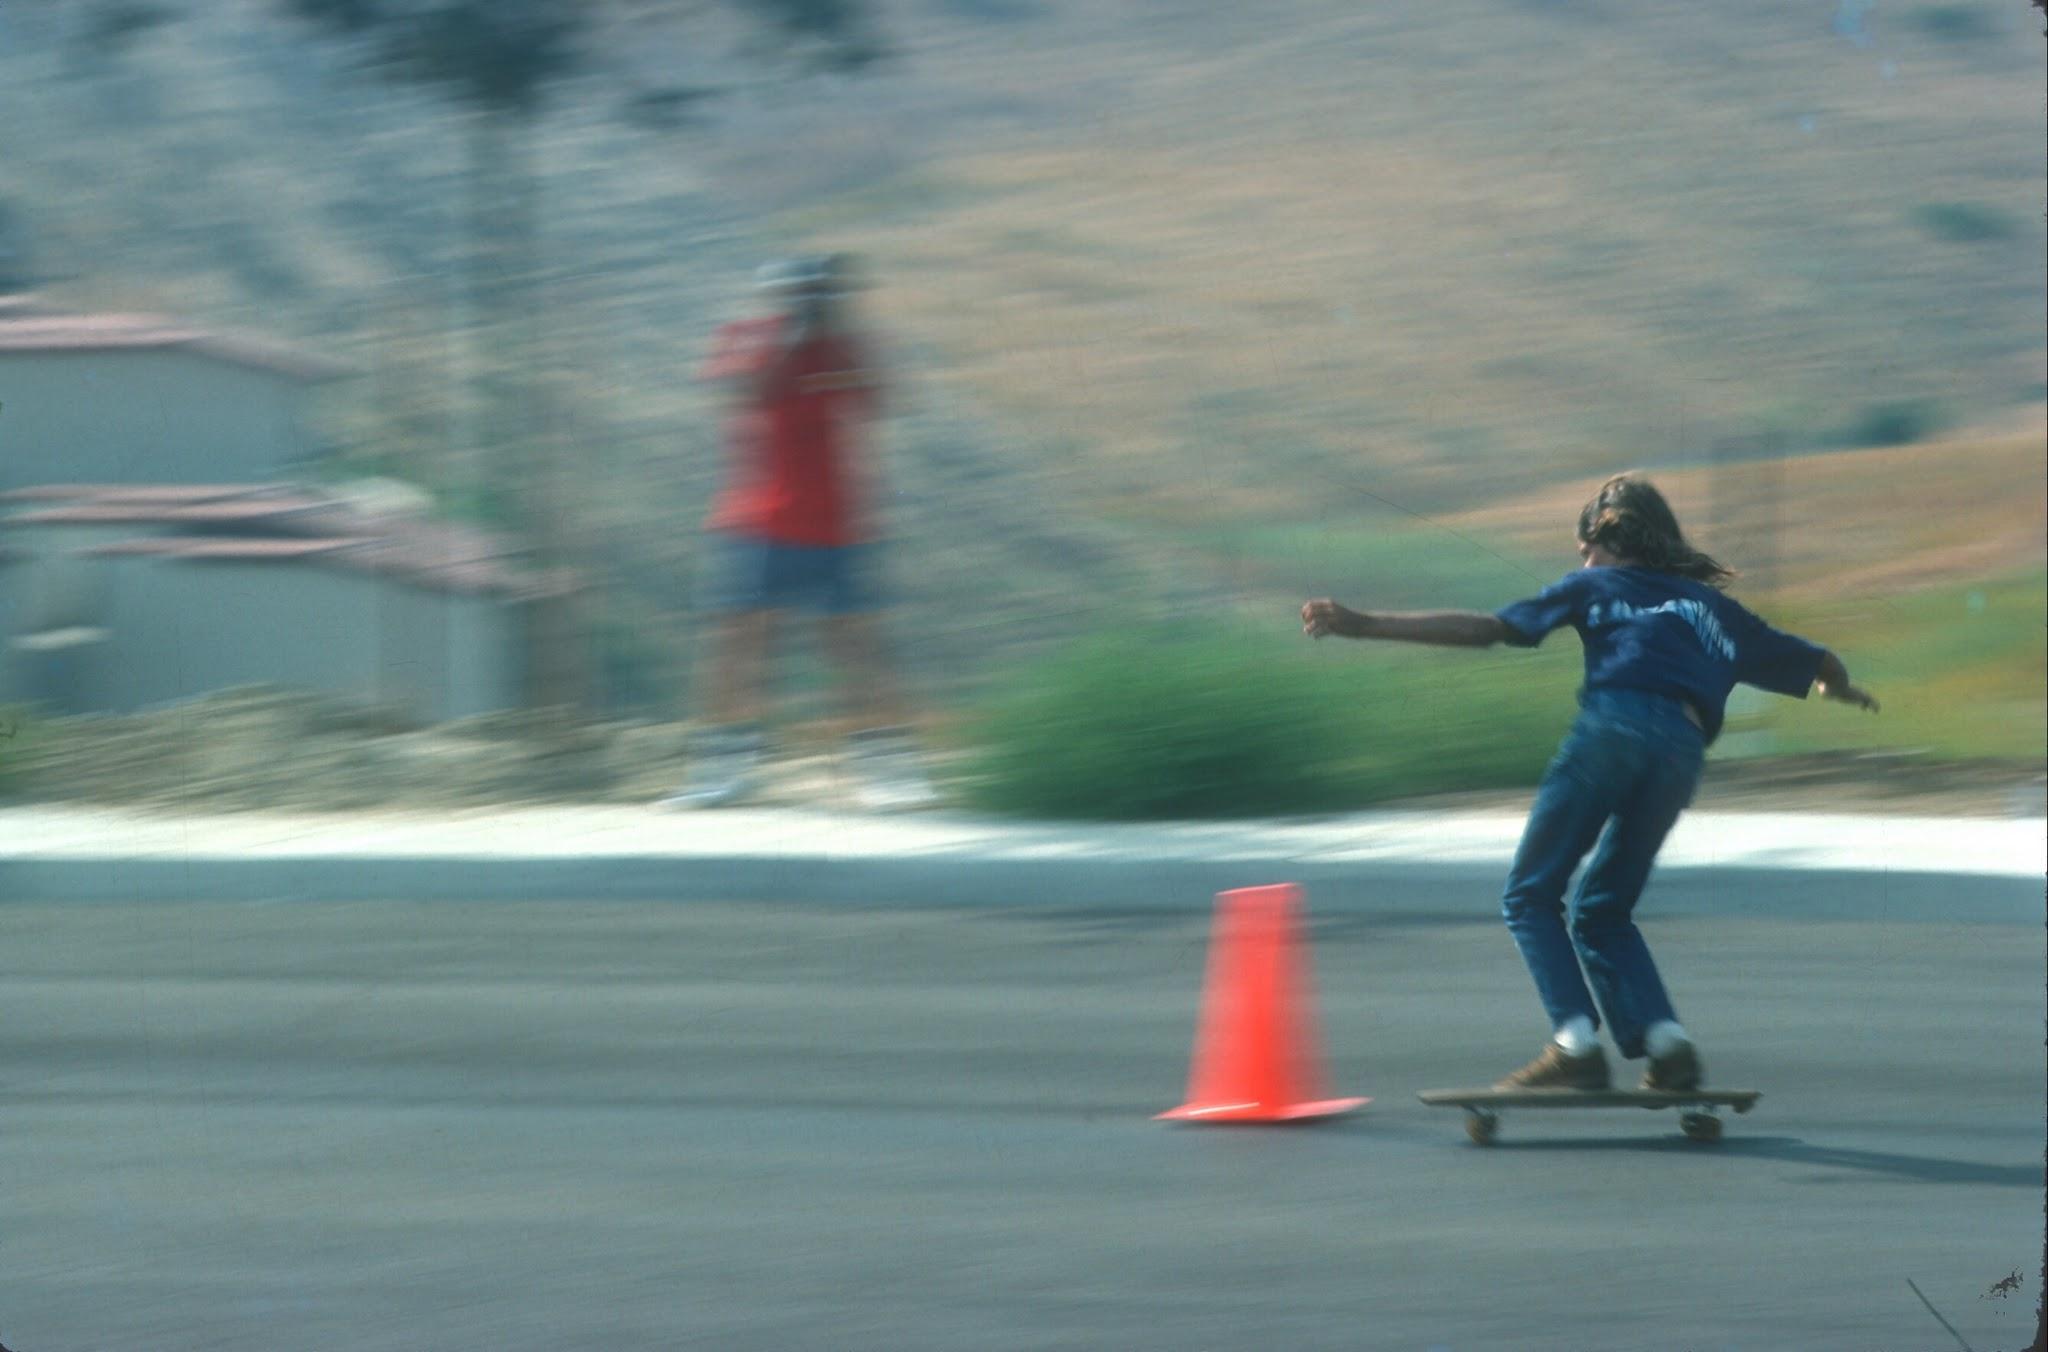 Photo: Speeding through the cones at La Costa (Warren Bolster in Background)